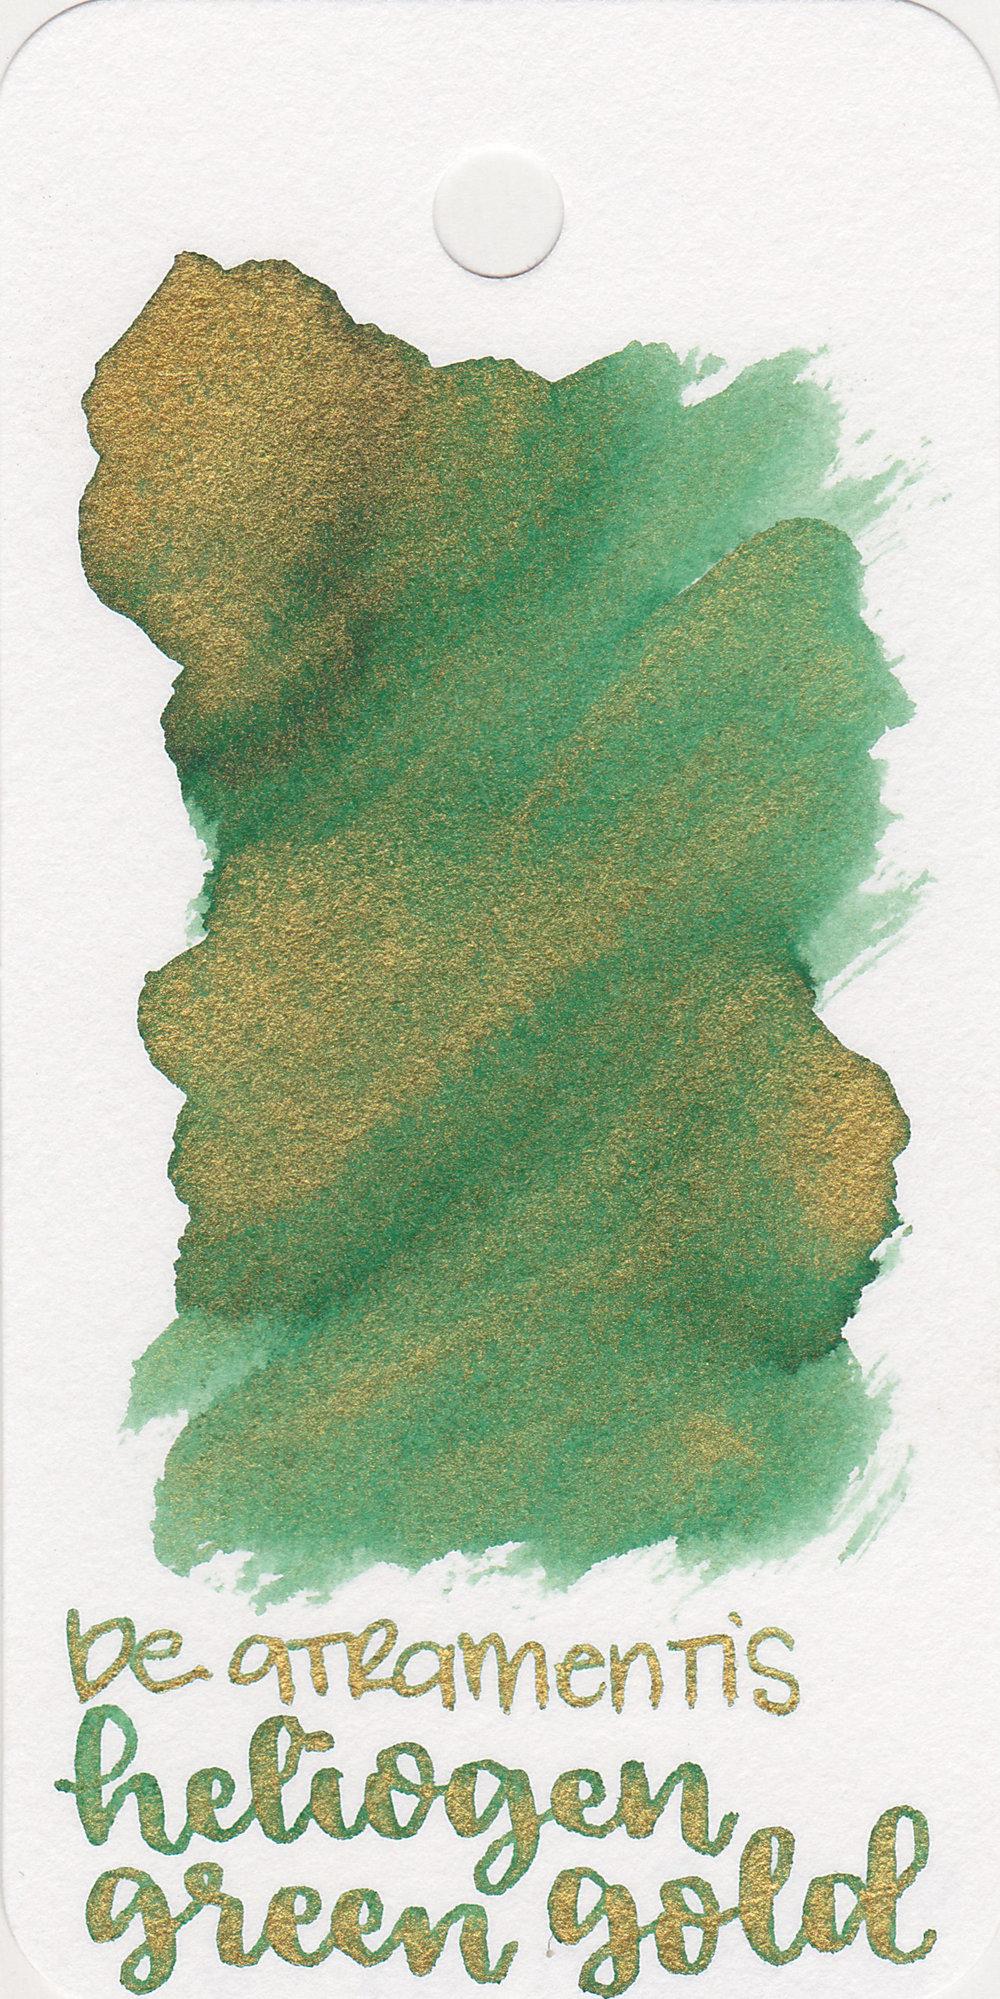 da-heliogen-green-1.jpg